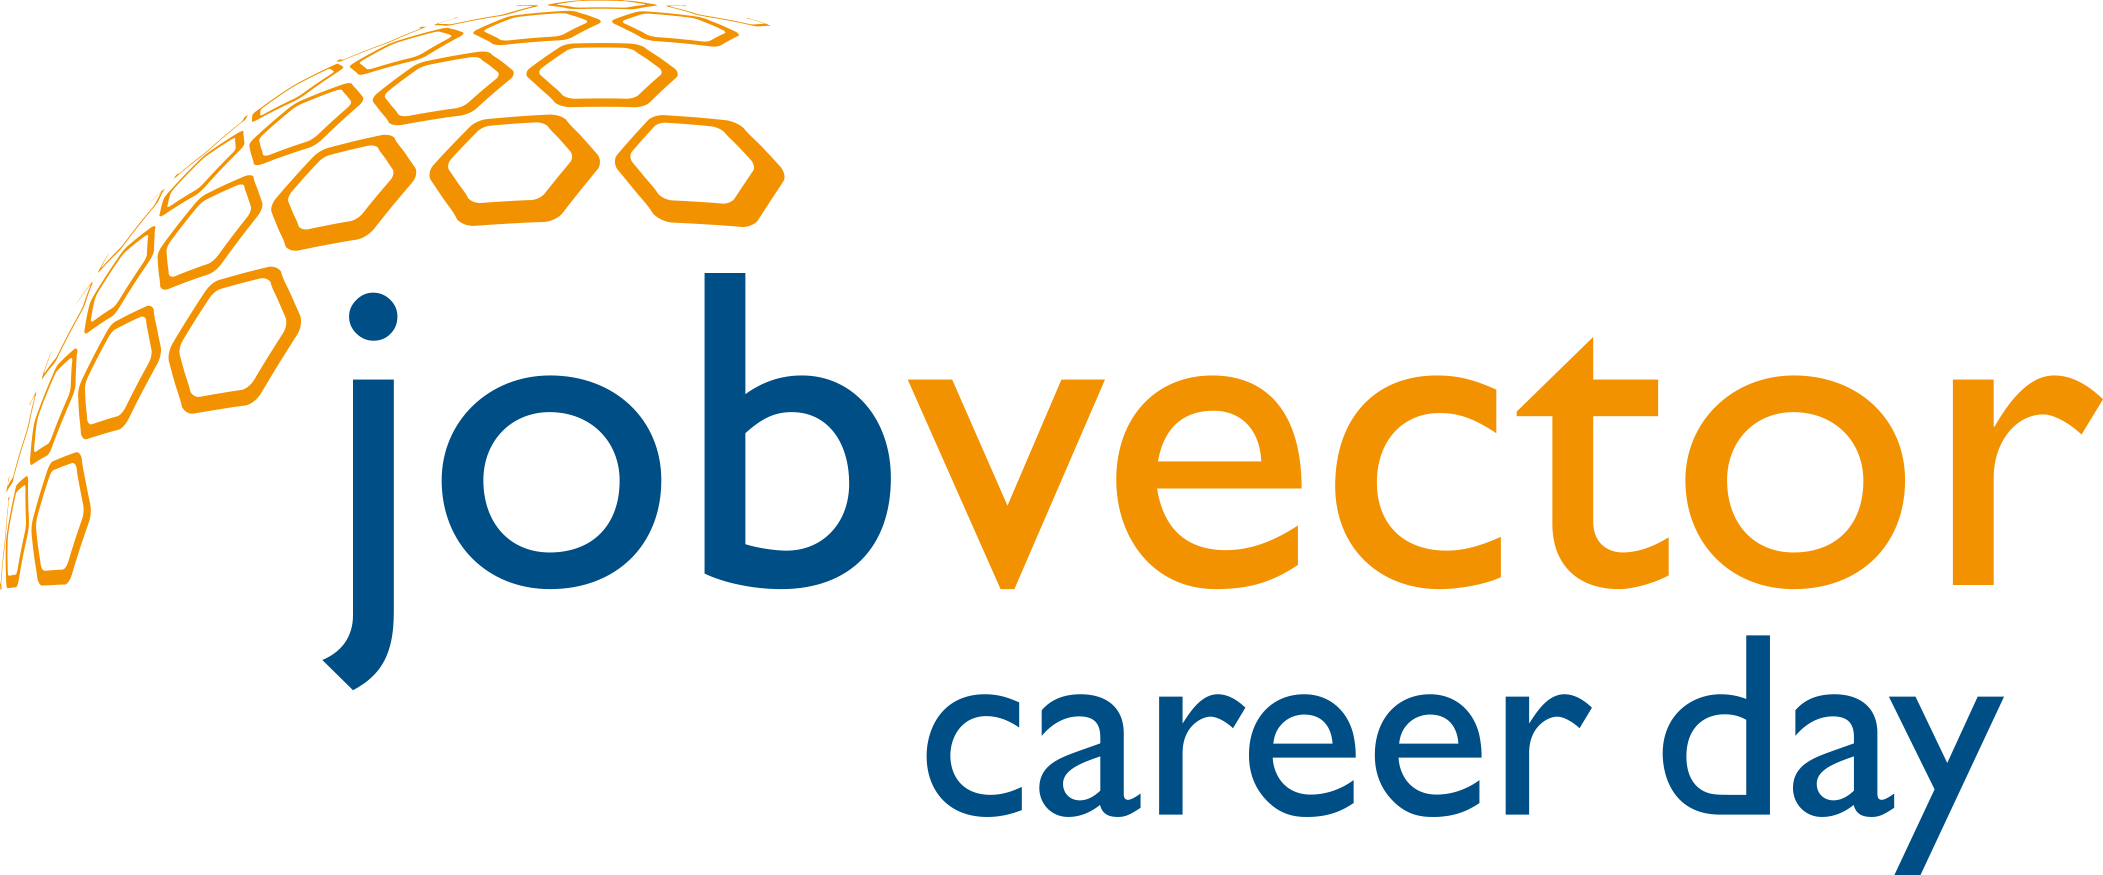 Jobvector, Jobvector.de, Jobvector.com, Jobvector Jobbörse